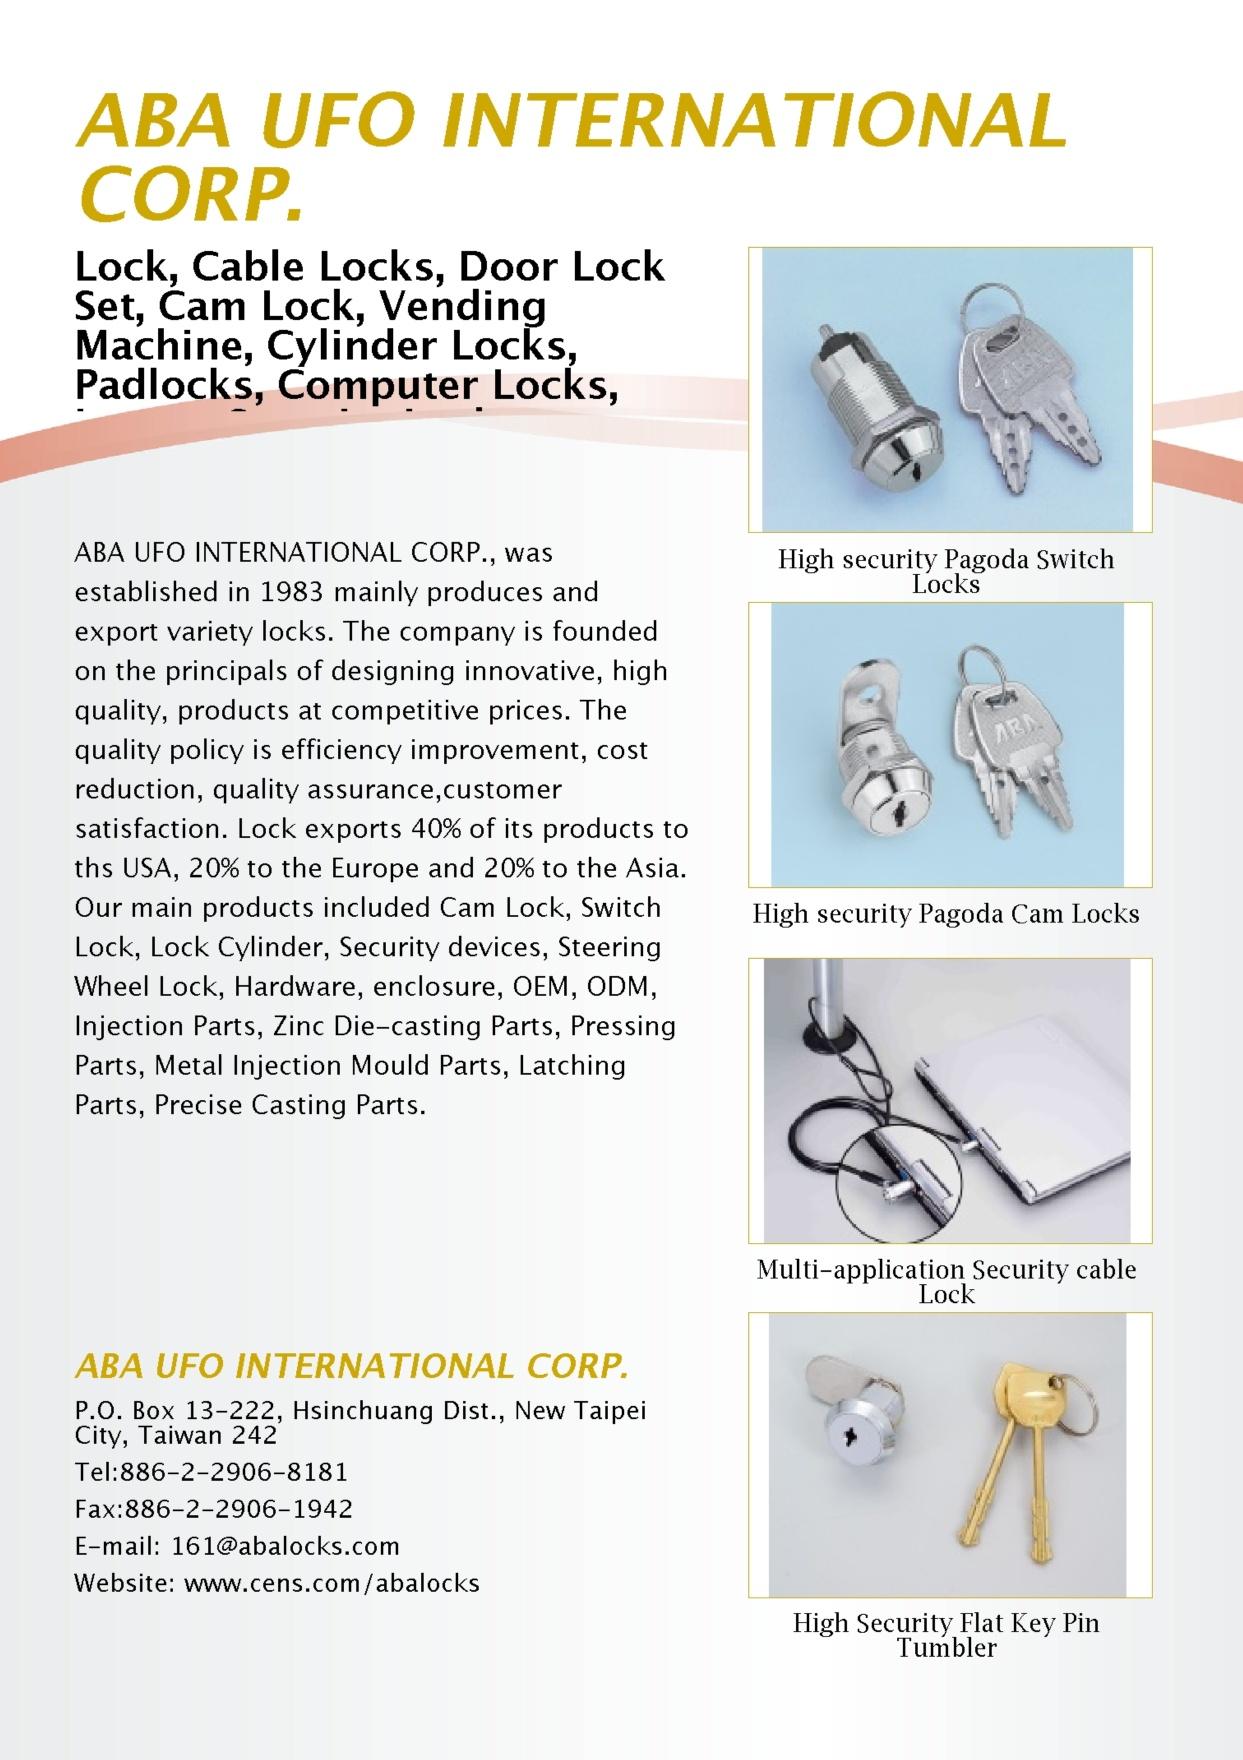 ABA LOCKS INTERNATIONAL CO., LTD.